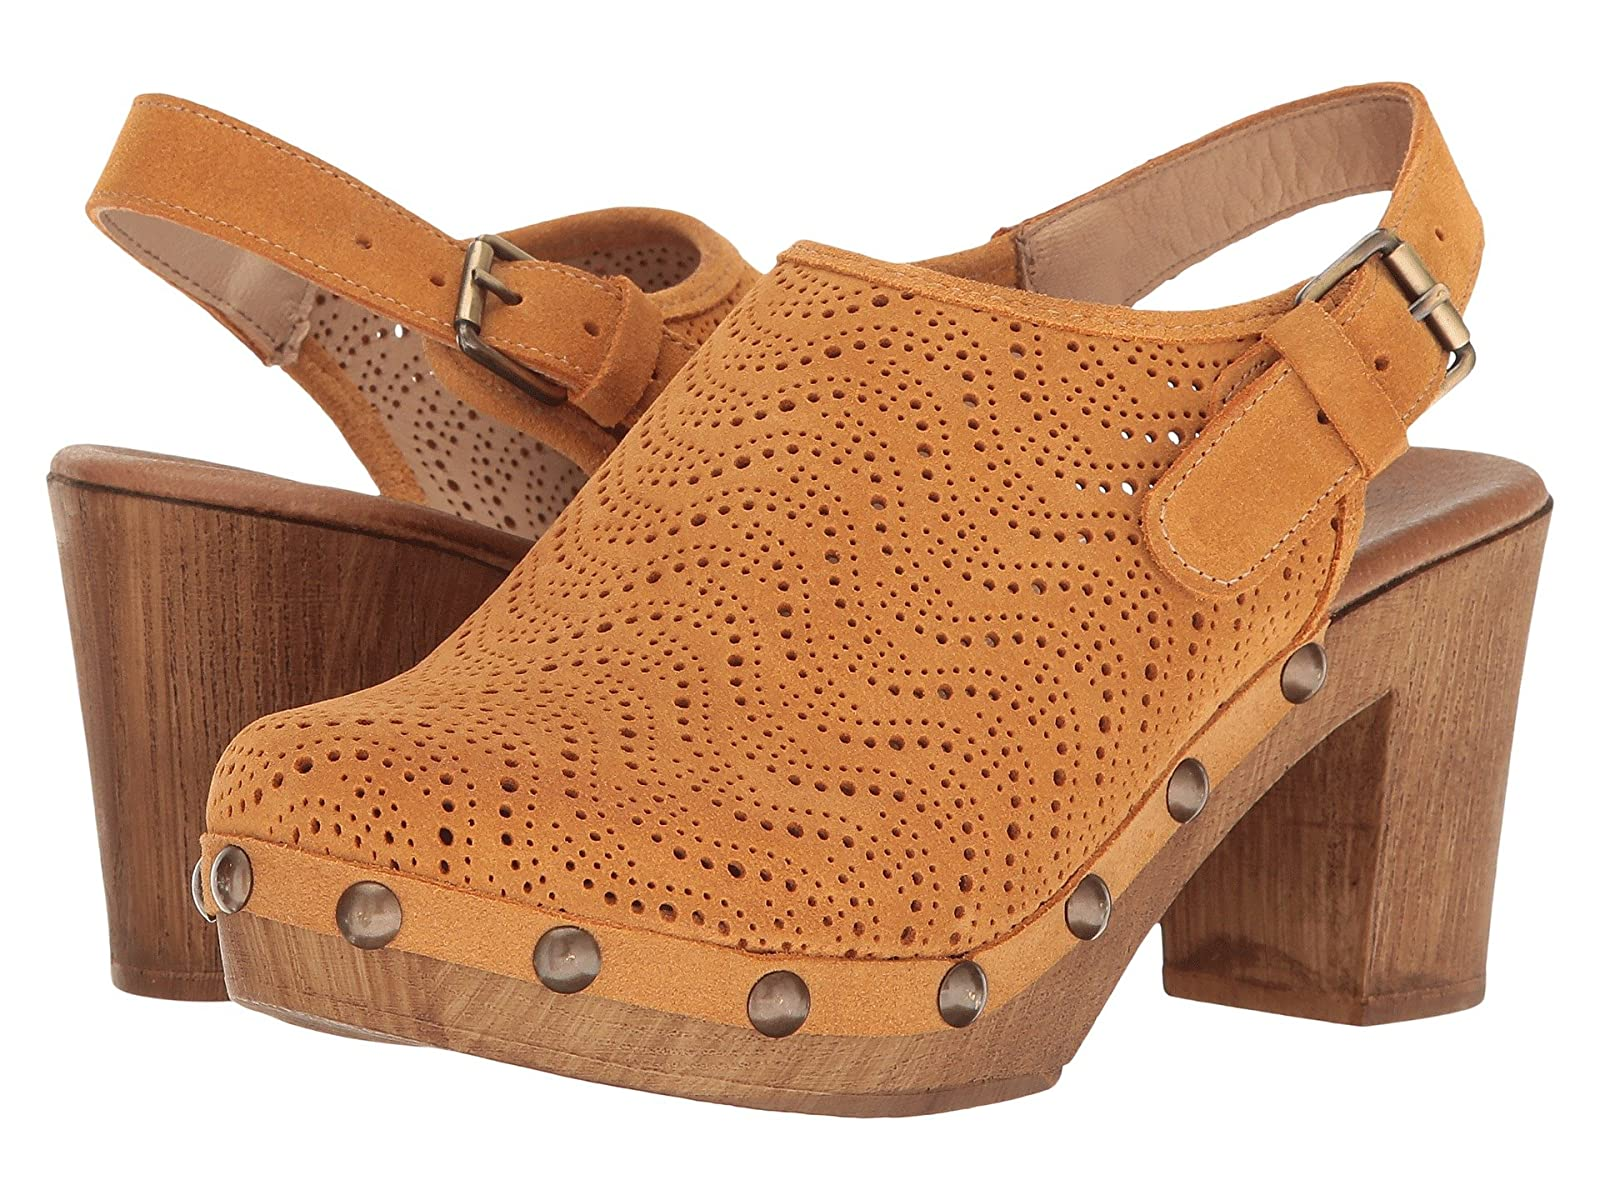 Eric Michael JuliaCheap and distinctive eye-catching shoes